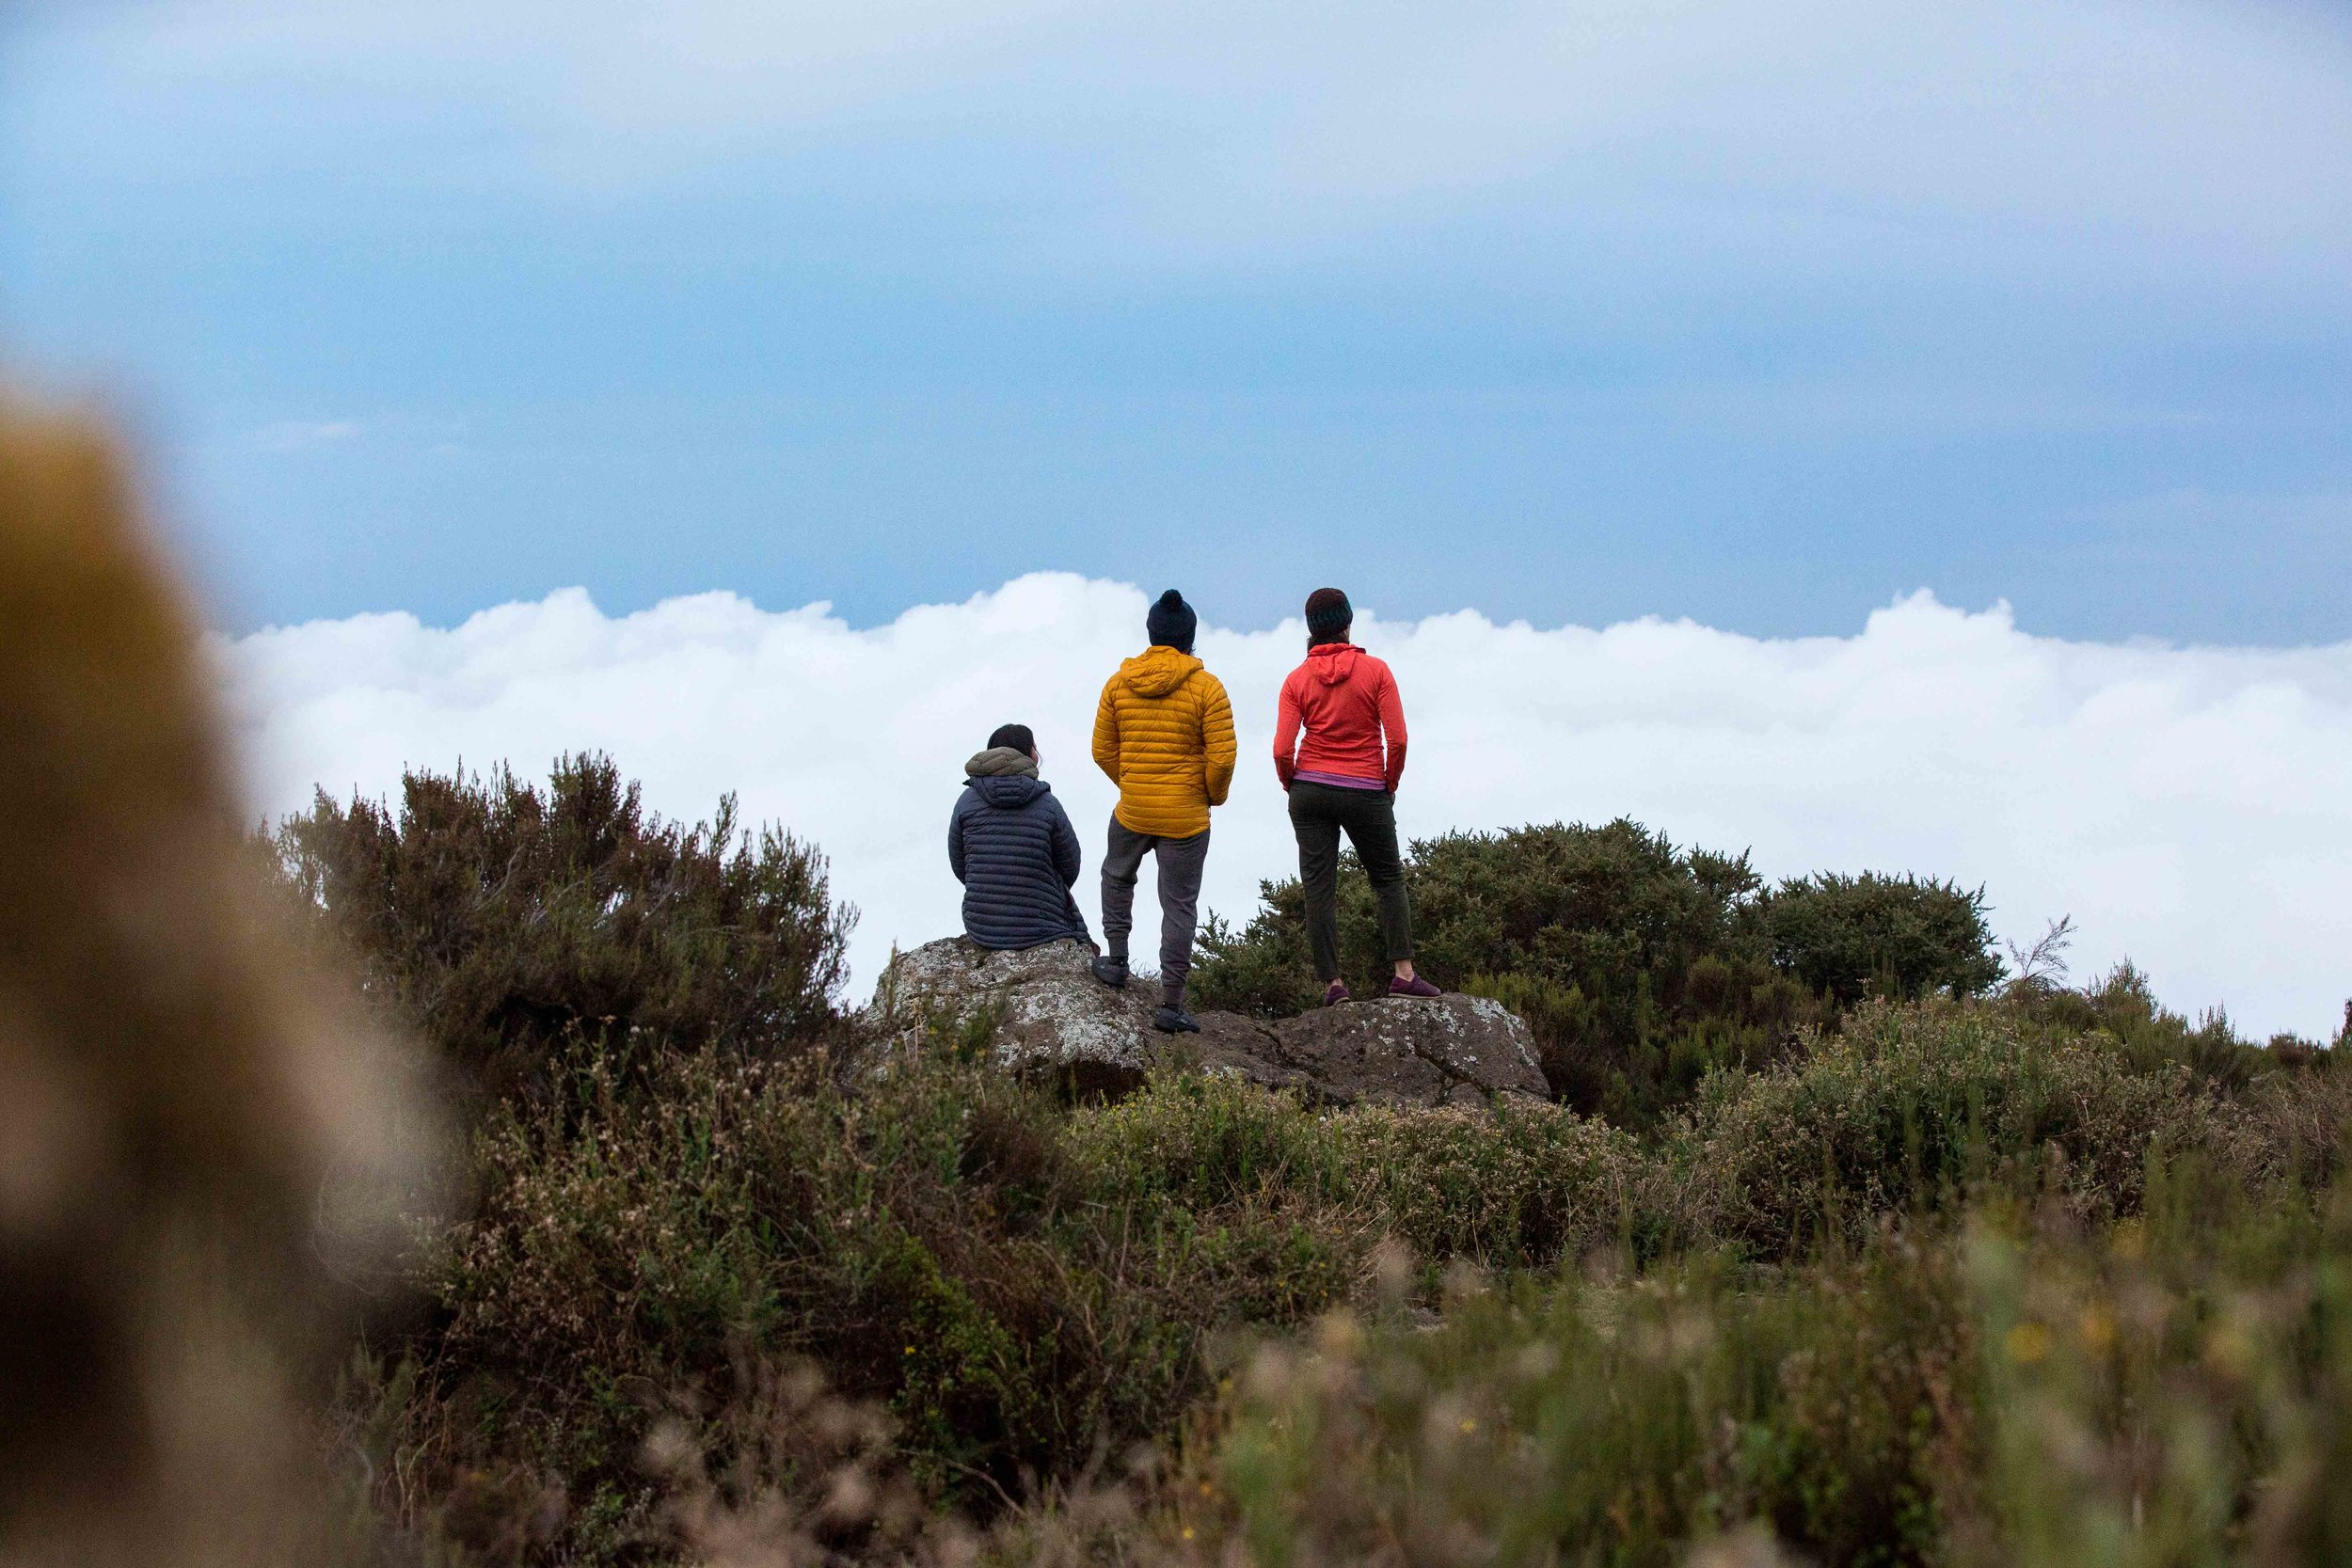 ajw_REI_Kilimanjaro-20.jpg